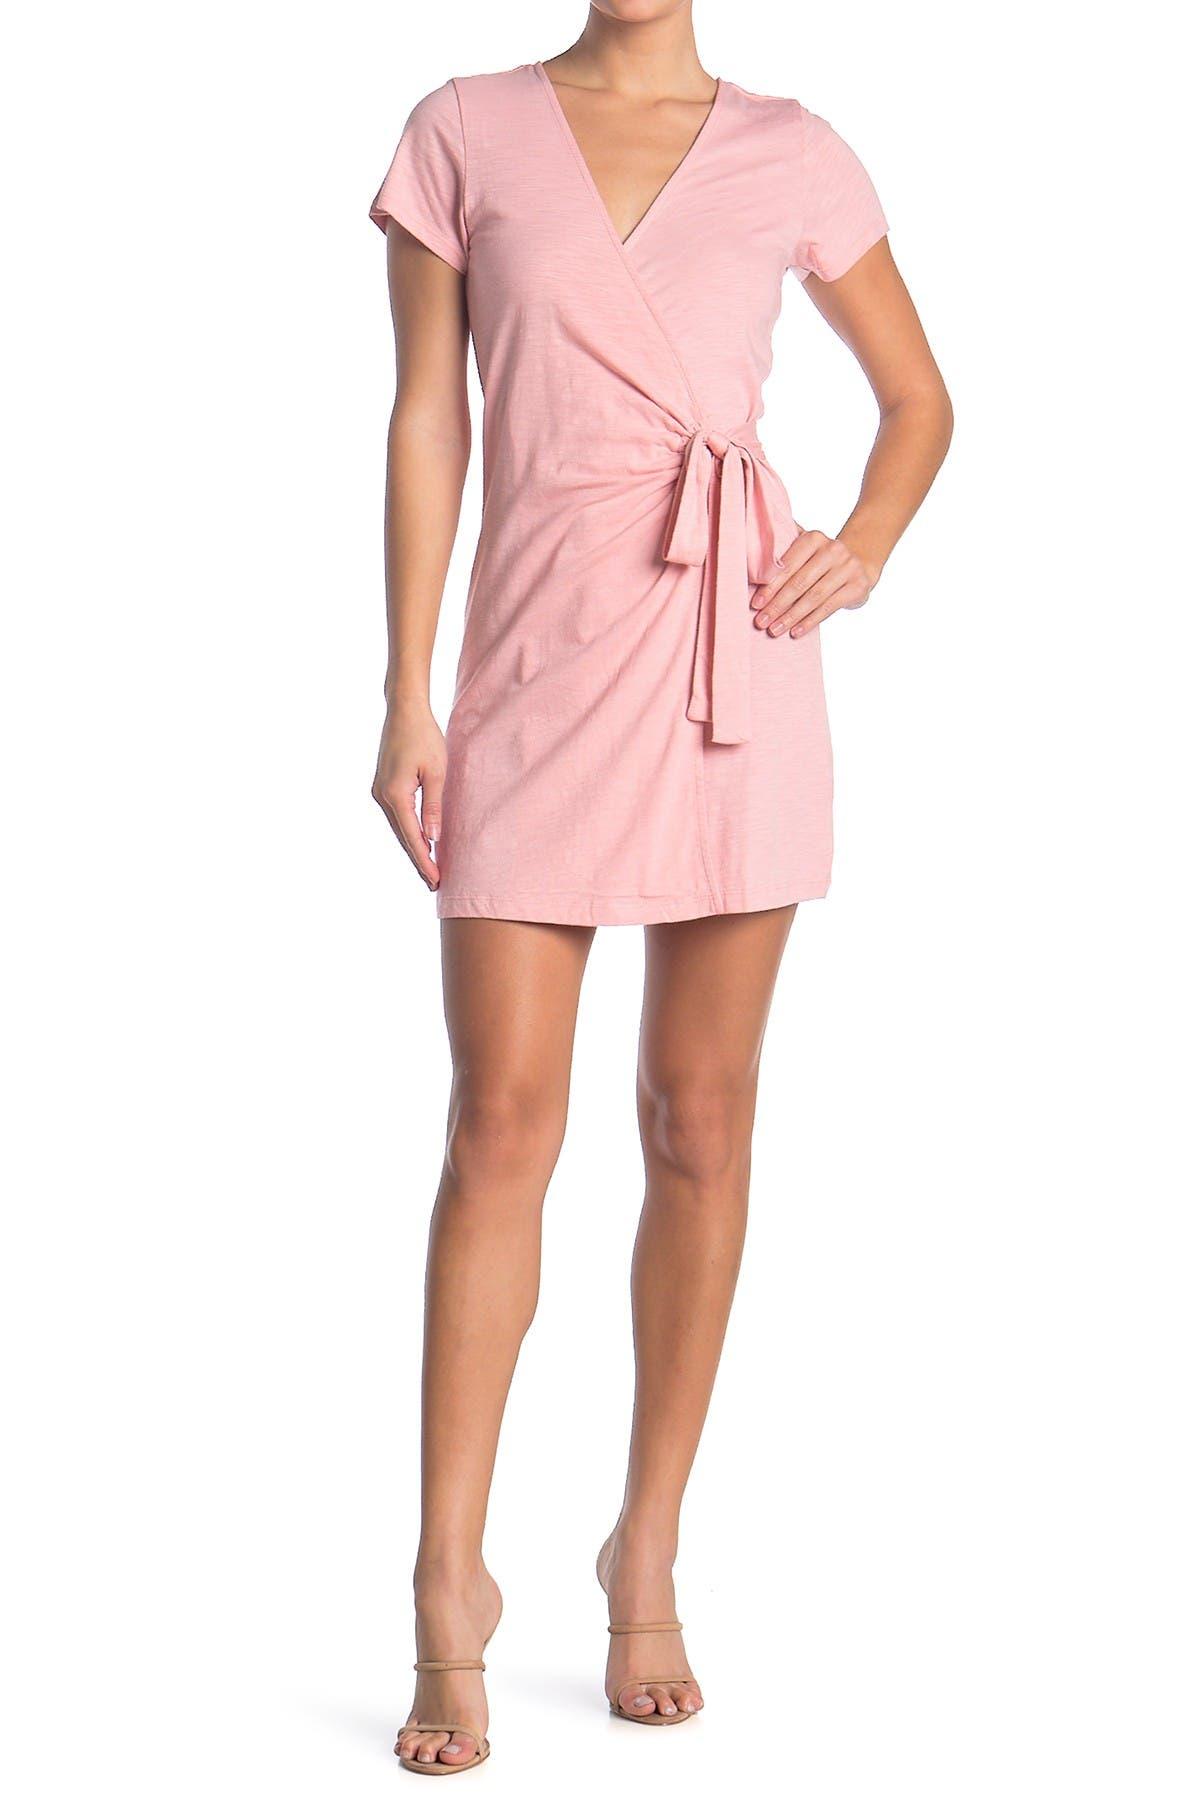 Image of Sanctuary Short Sleeve Knit Wrap Dress